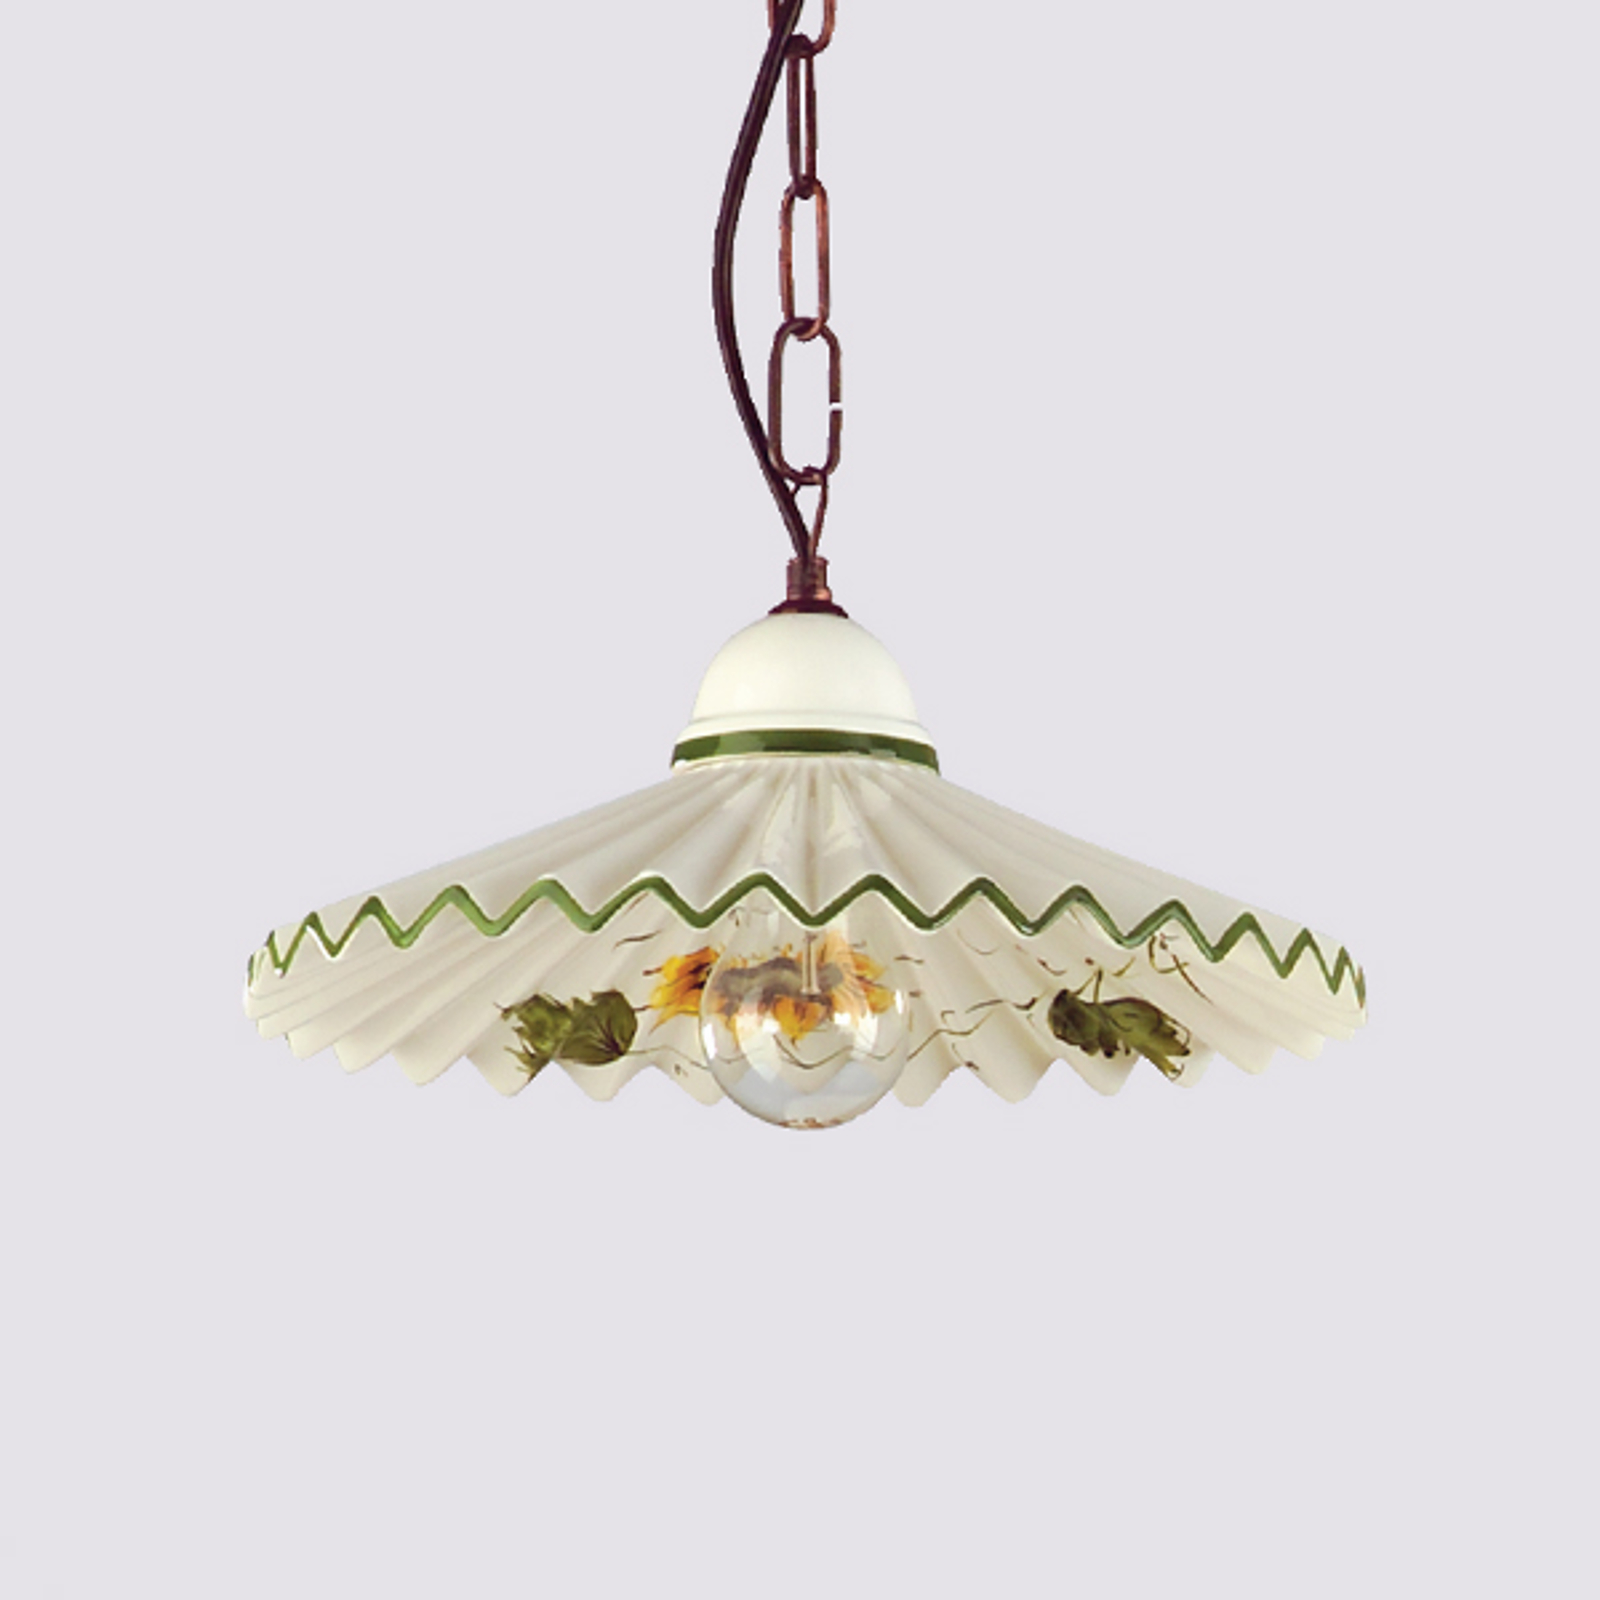 Hanglamp Rusticana met kettingophanging